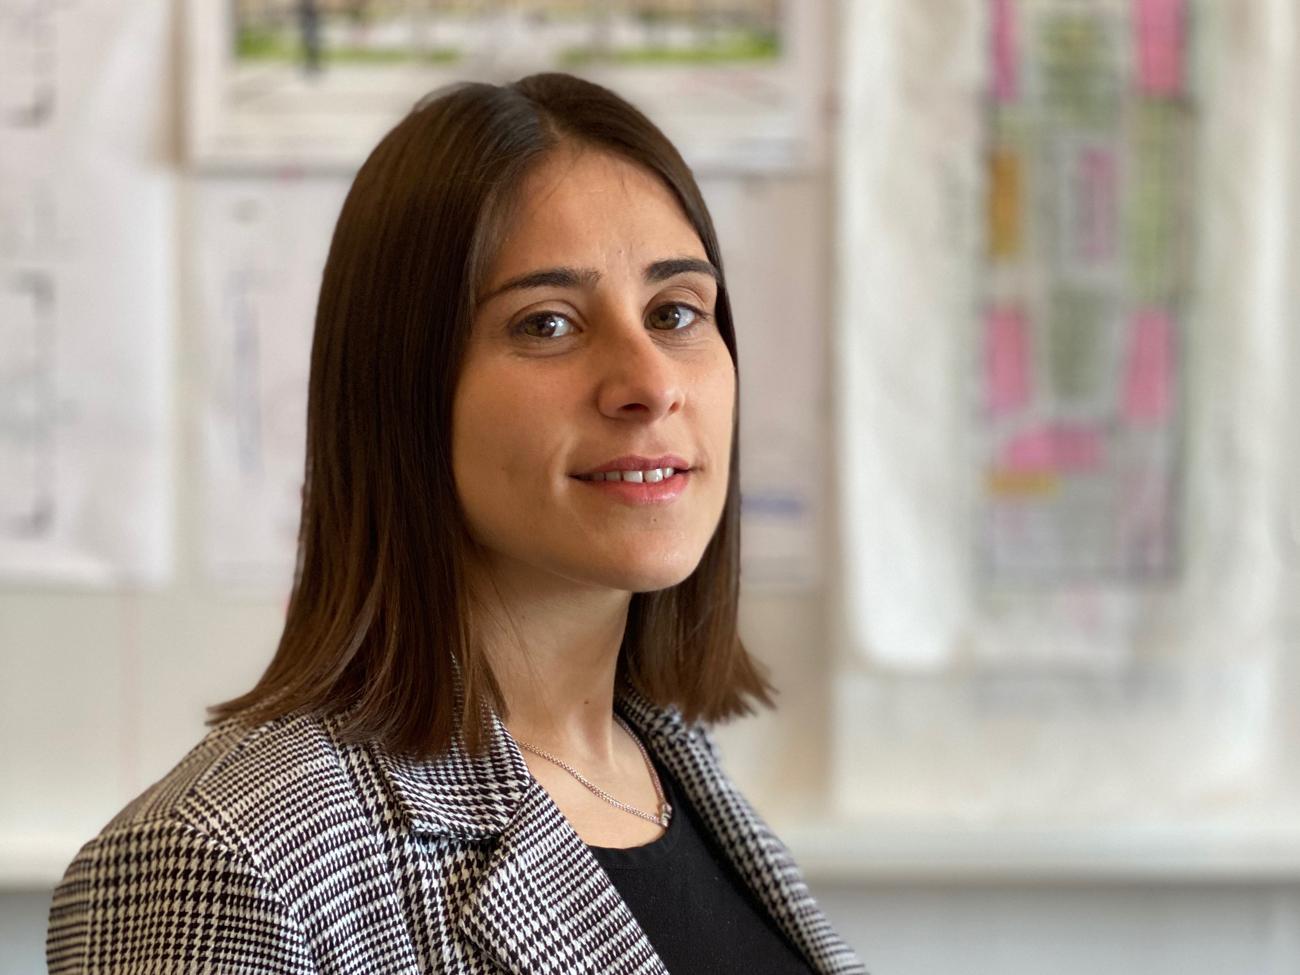 Beatriz Barreres-Designer, Architecture 1